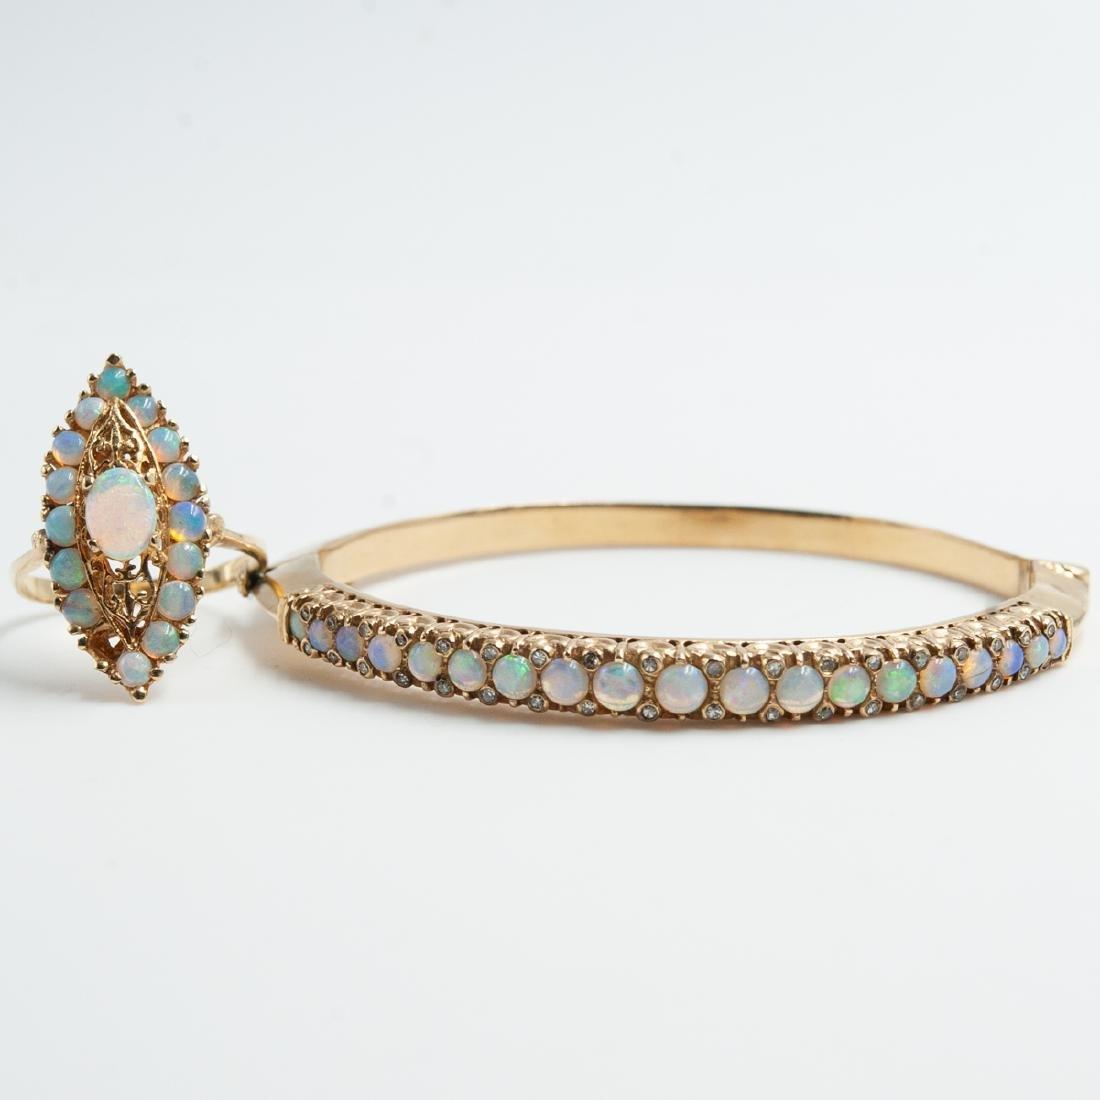 14K Gold & Opal Jewelry Set